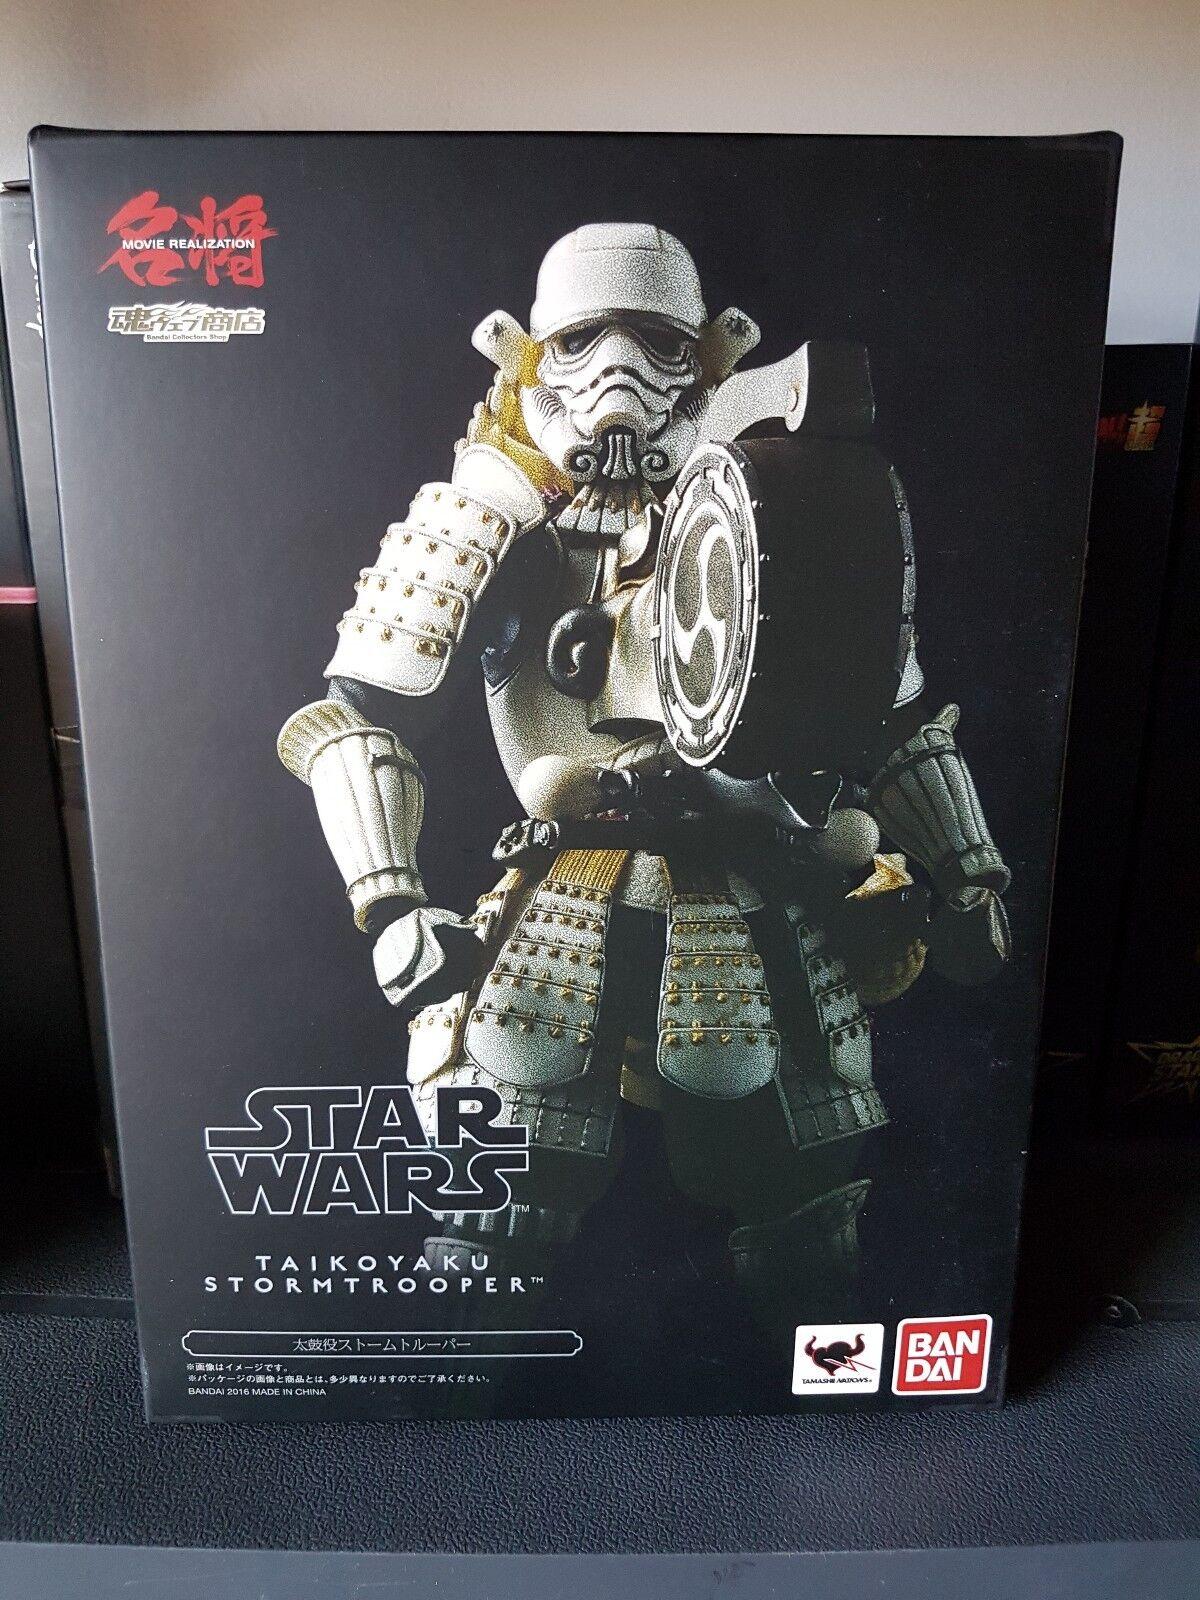 Bandai Star Wars Movie Realization Taikoyaku Stormtrooper